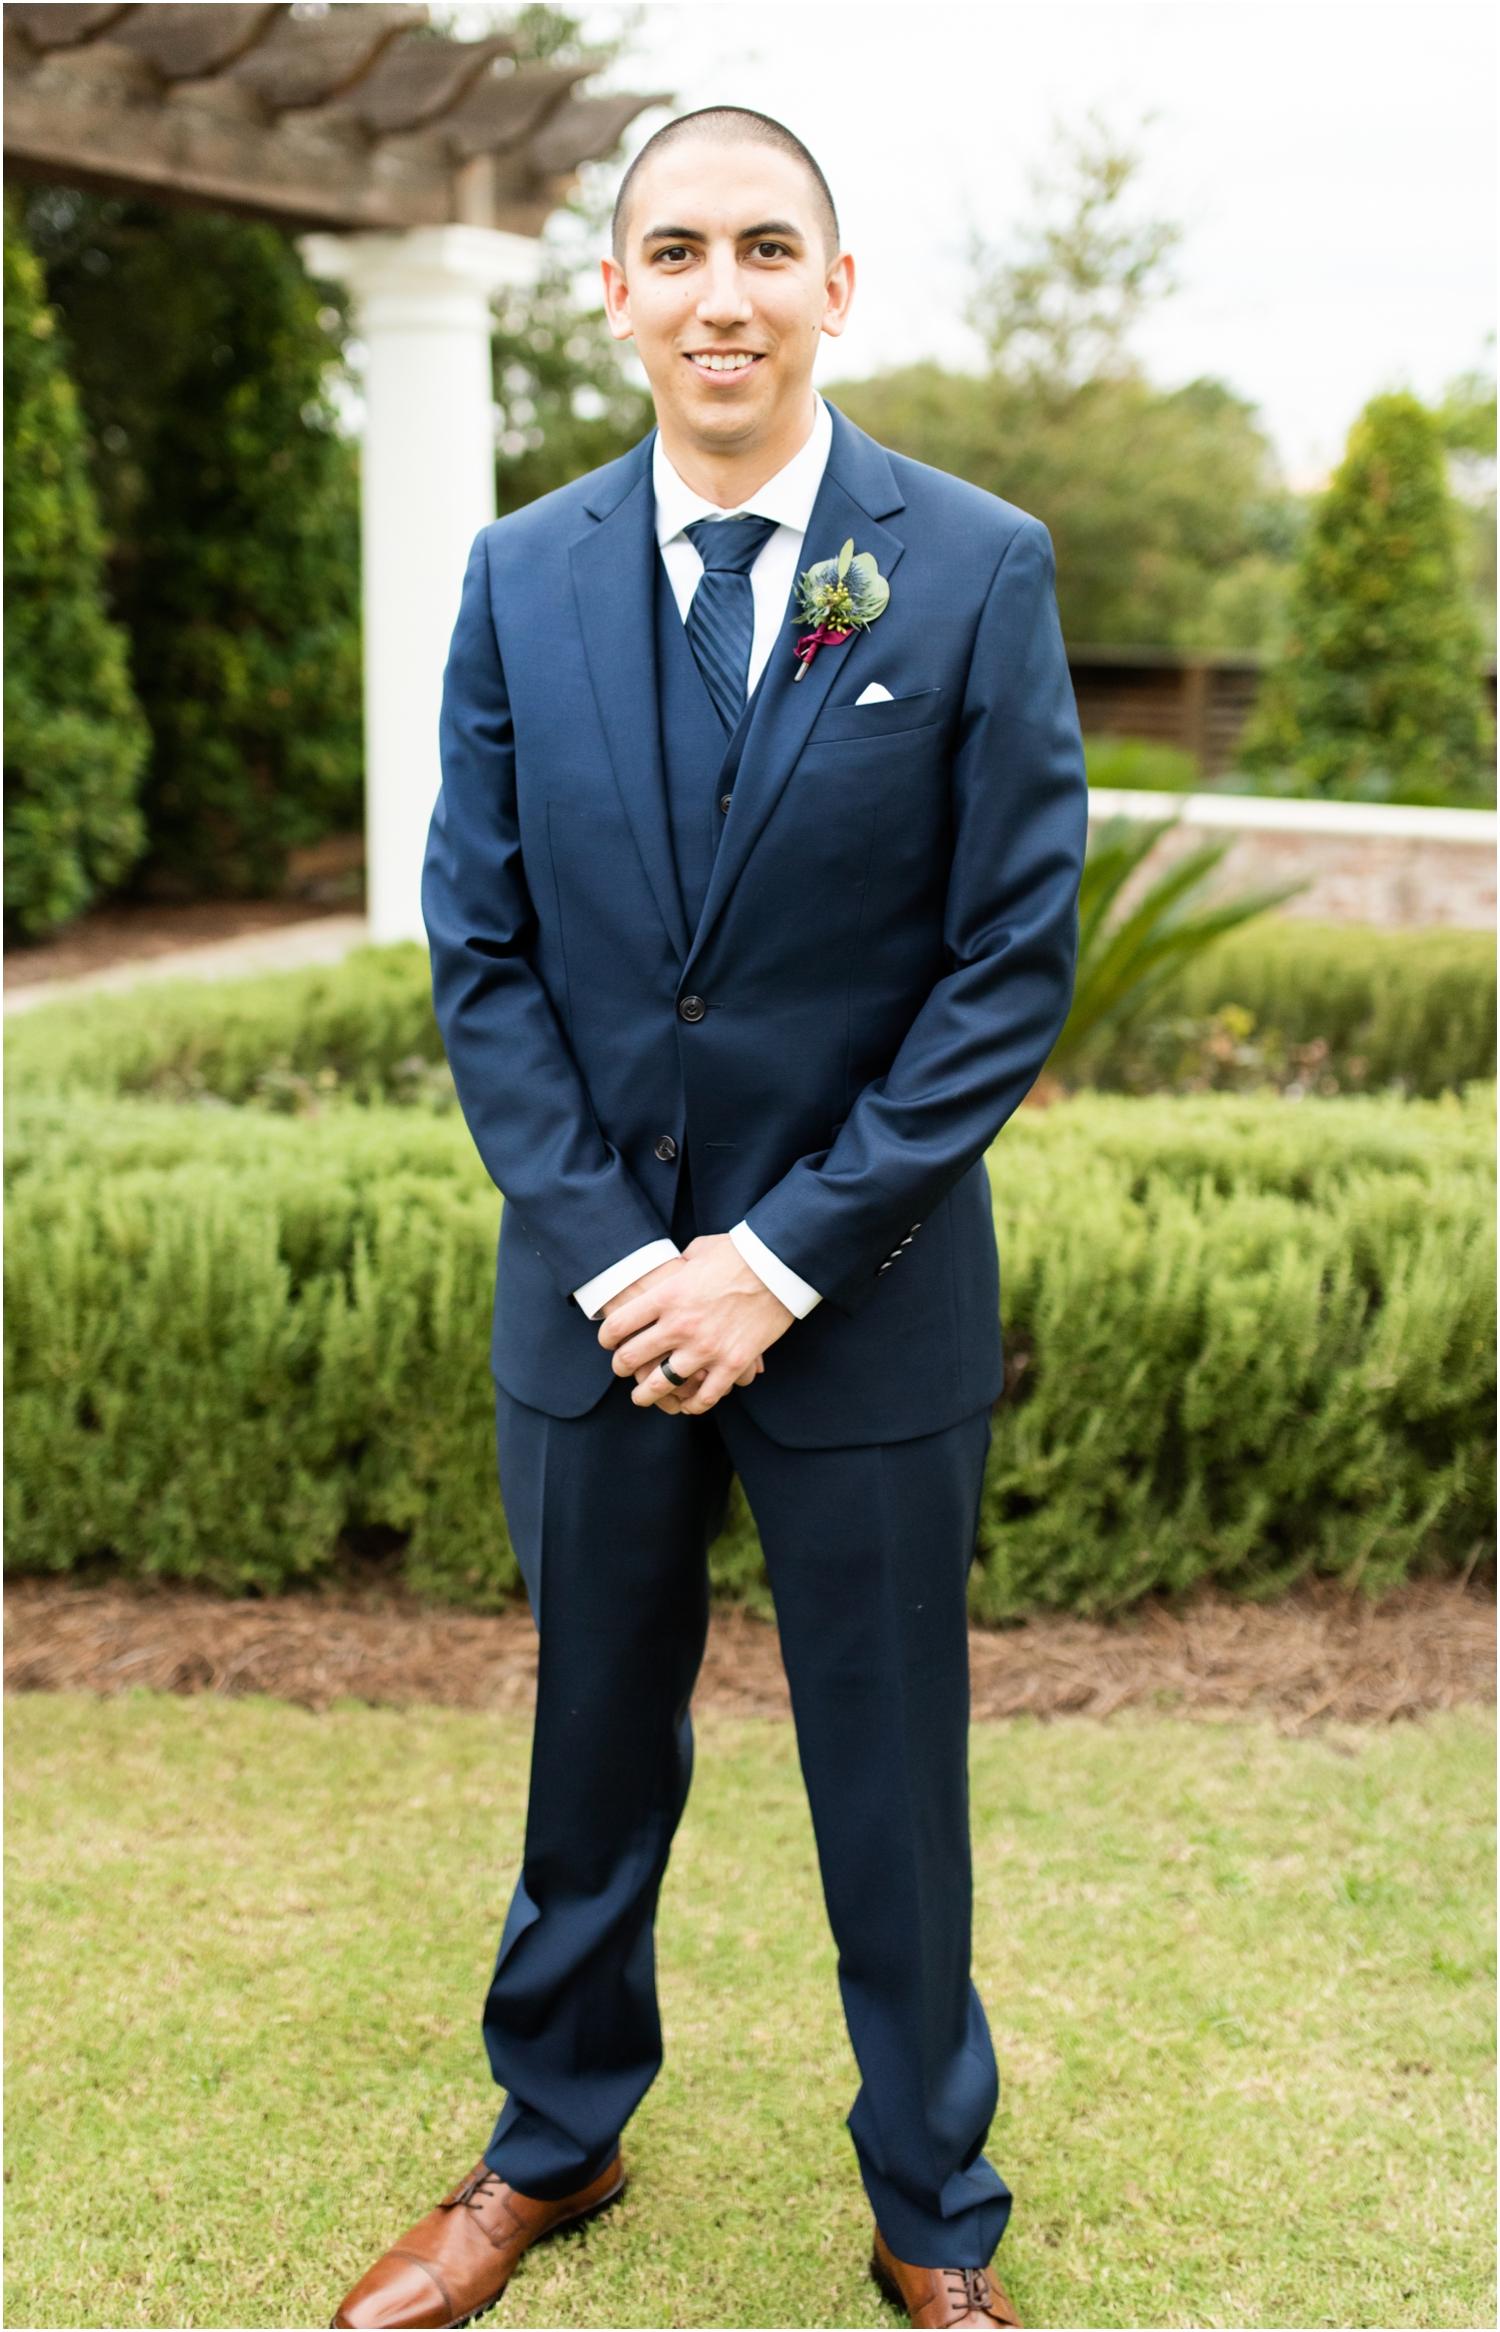 Henderson Beach Resort Inn Destin Florida Wedding Photographer Groom Portrait